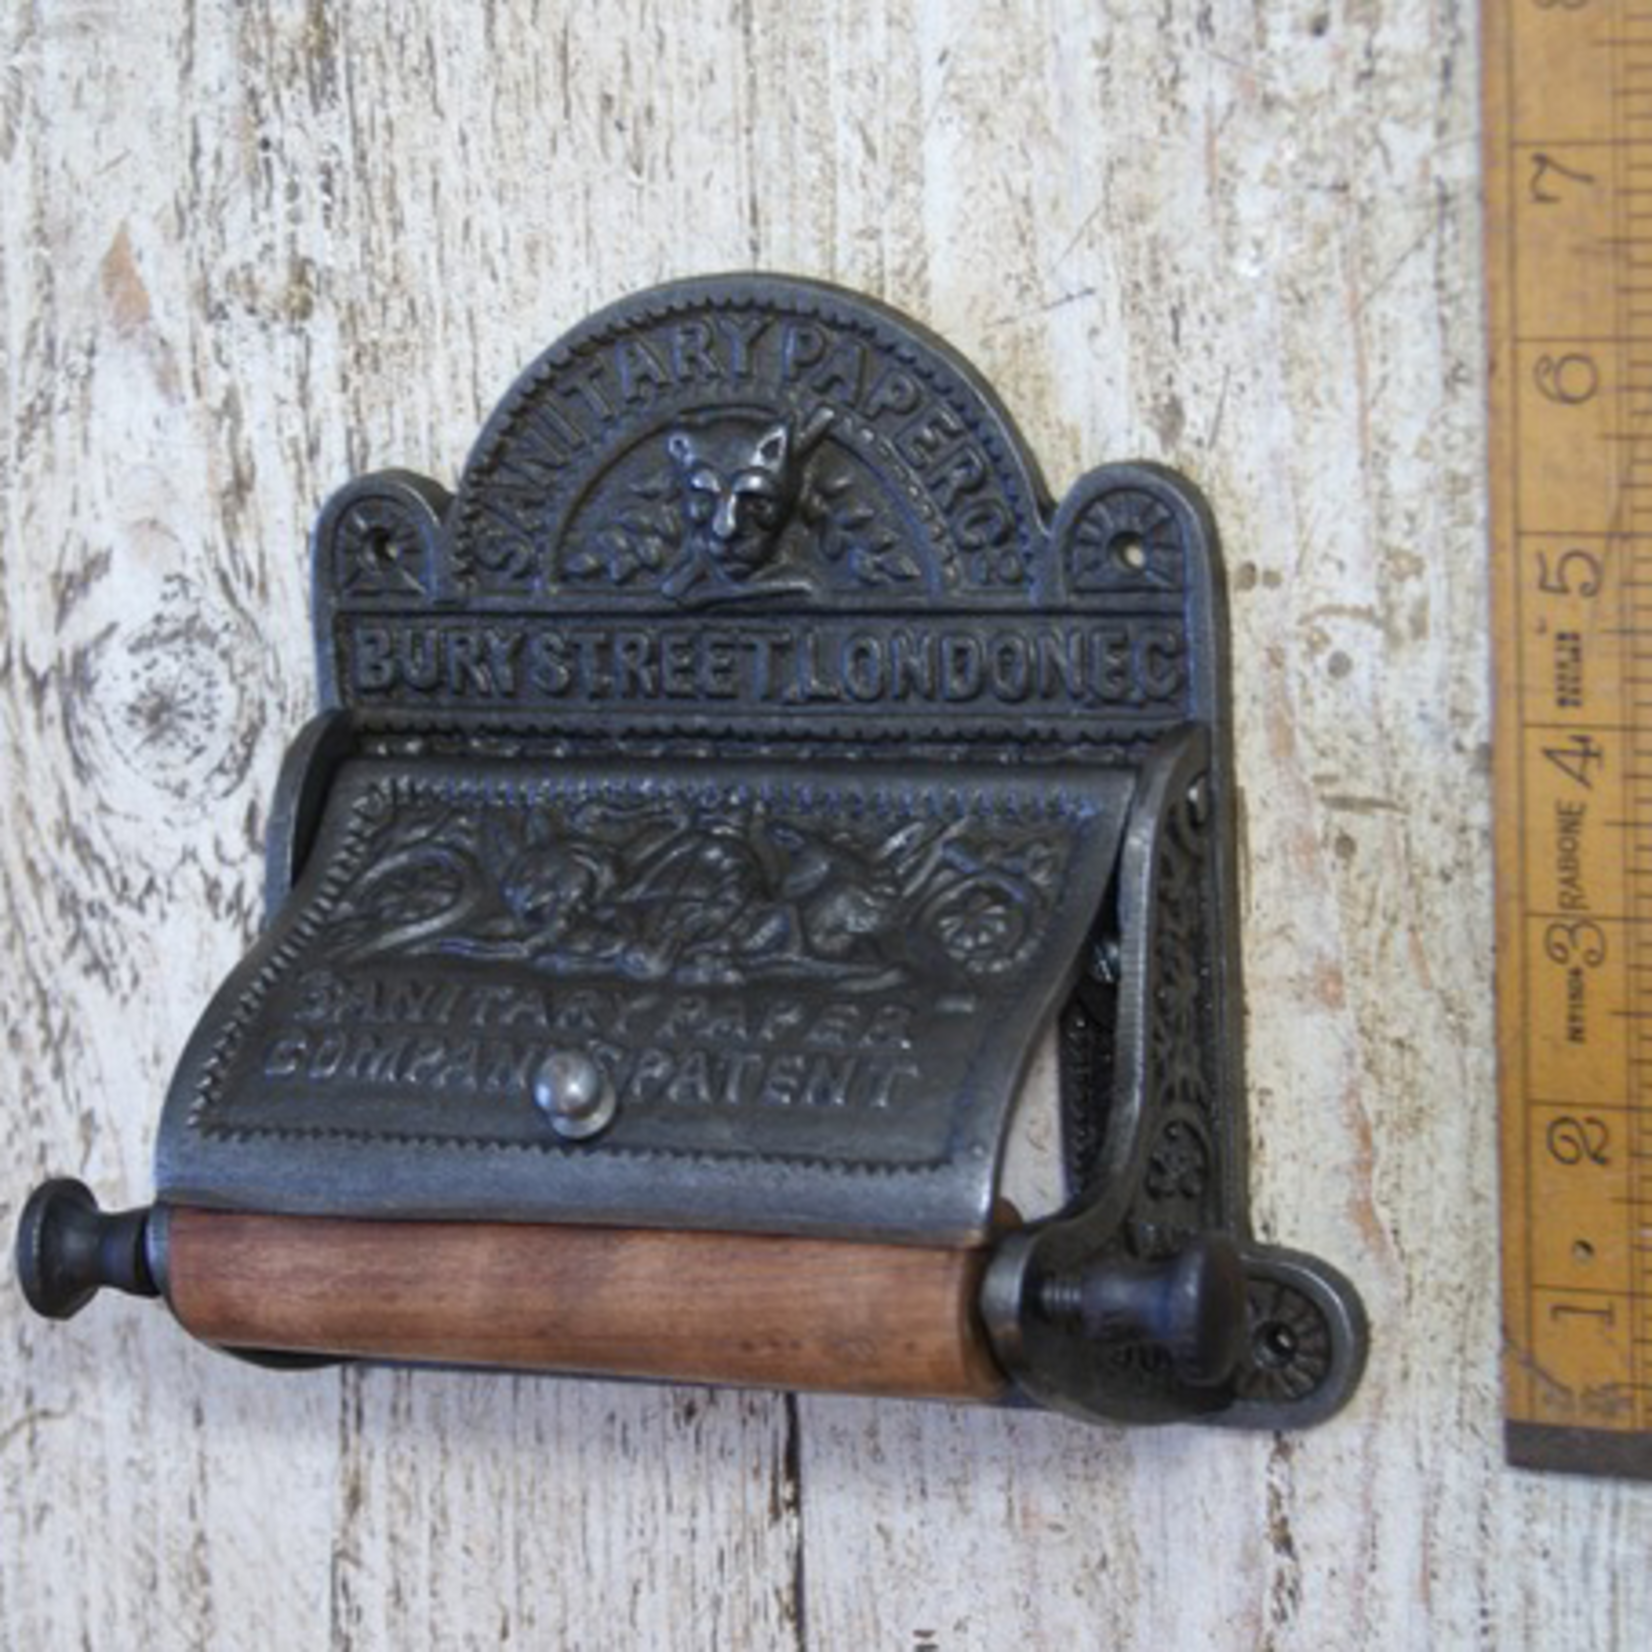 IRON RANGE Antique Iron BURY ST LONDON Toilet Roll Holder